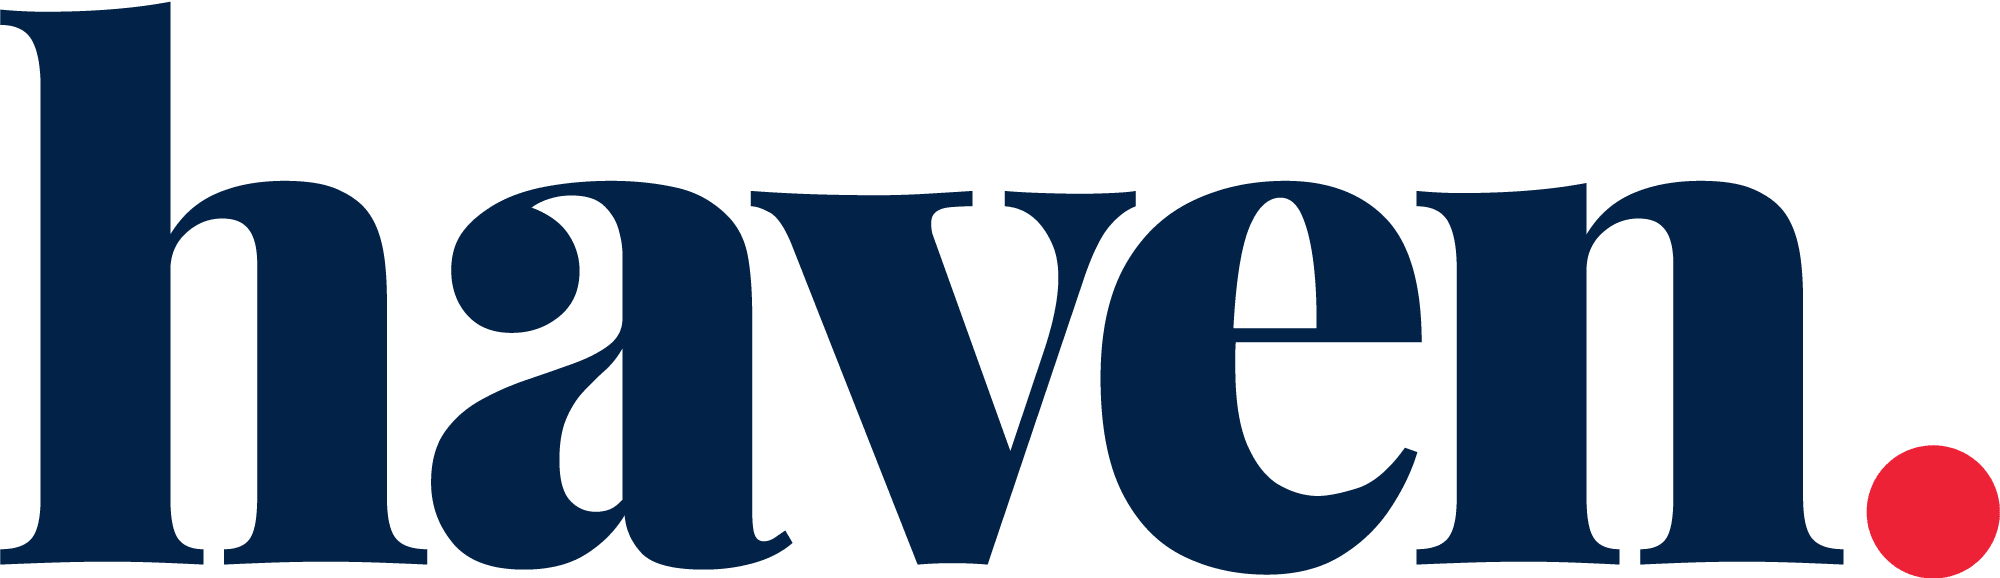 Footer logo of Steeplechase Village in Columbus, Ohio